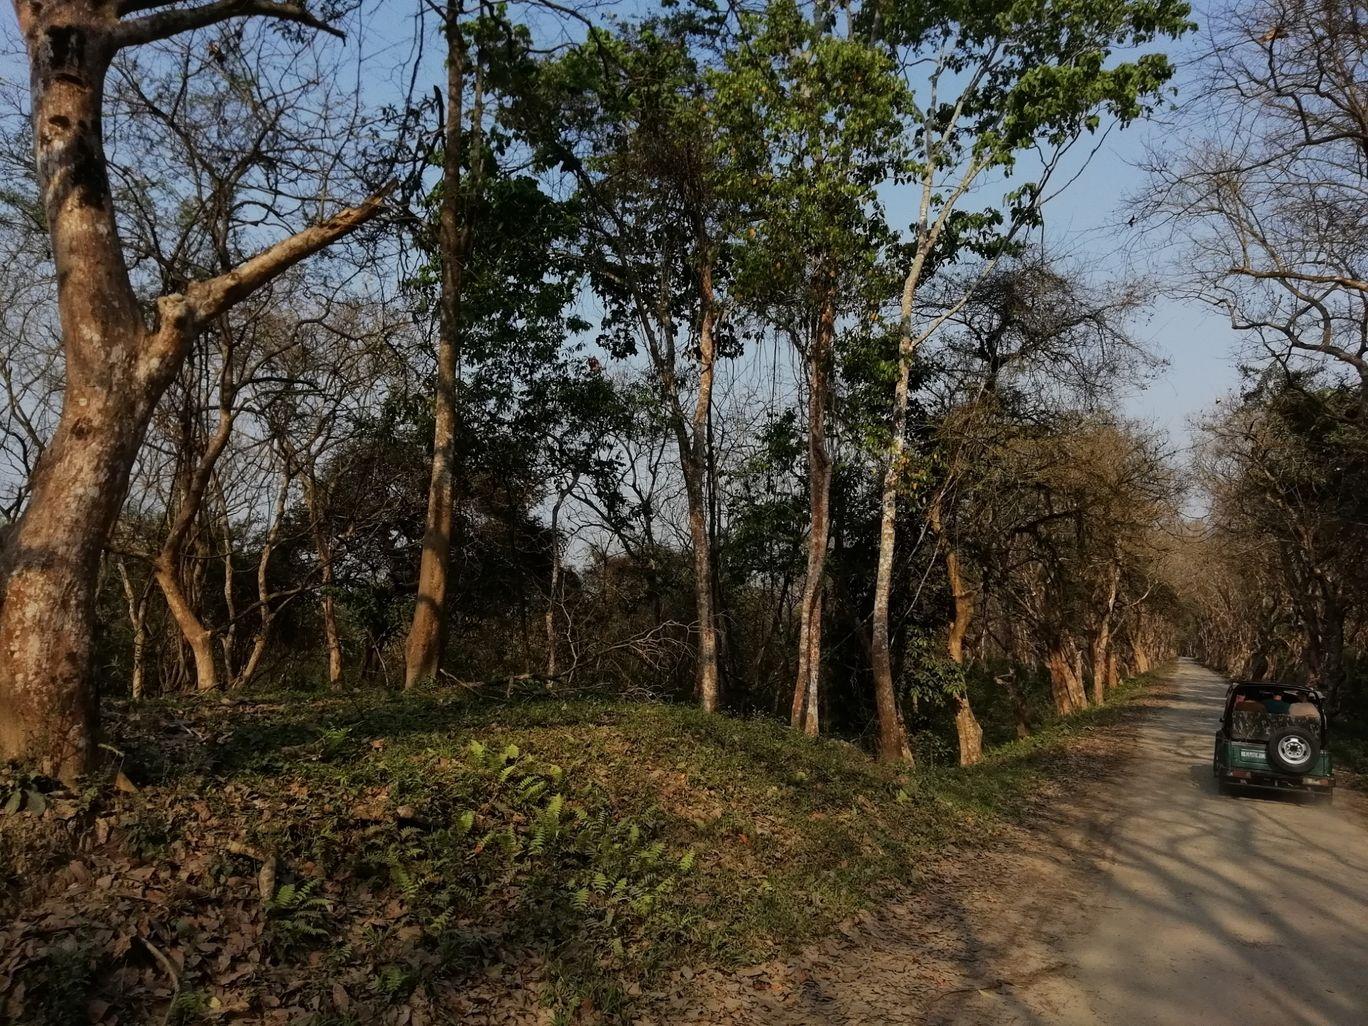 Photo of Kaziranga National Park By Devarshi Talukdar